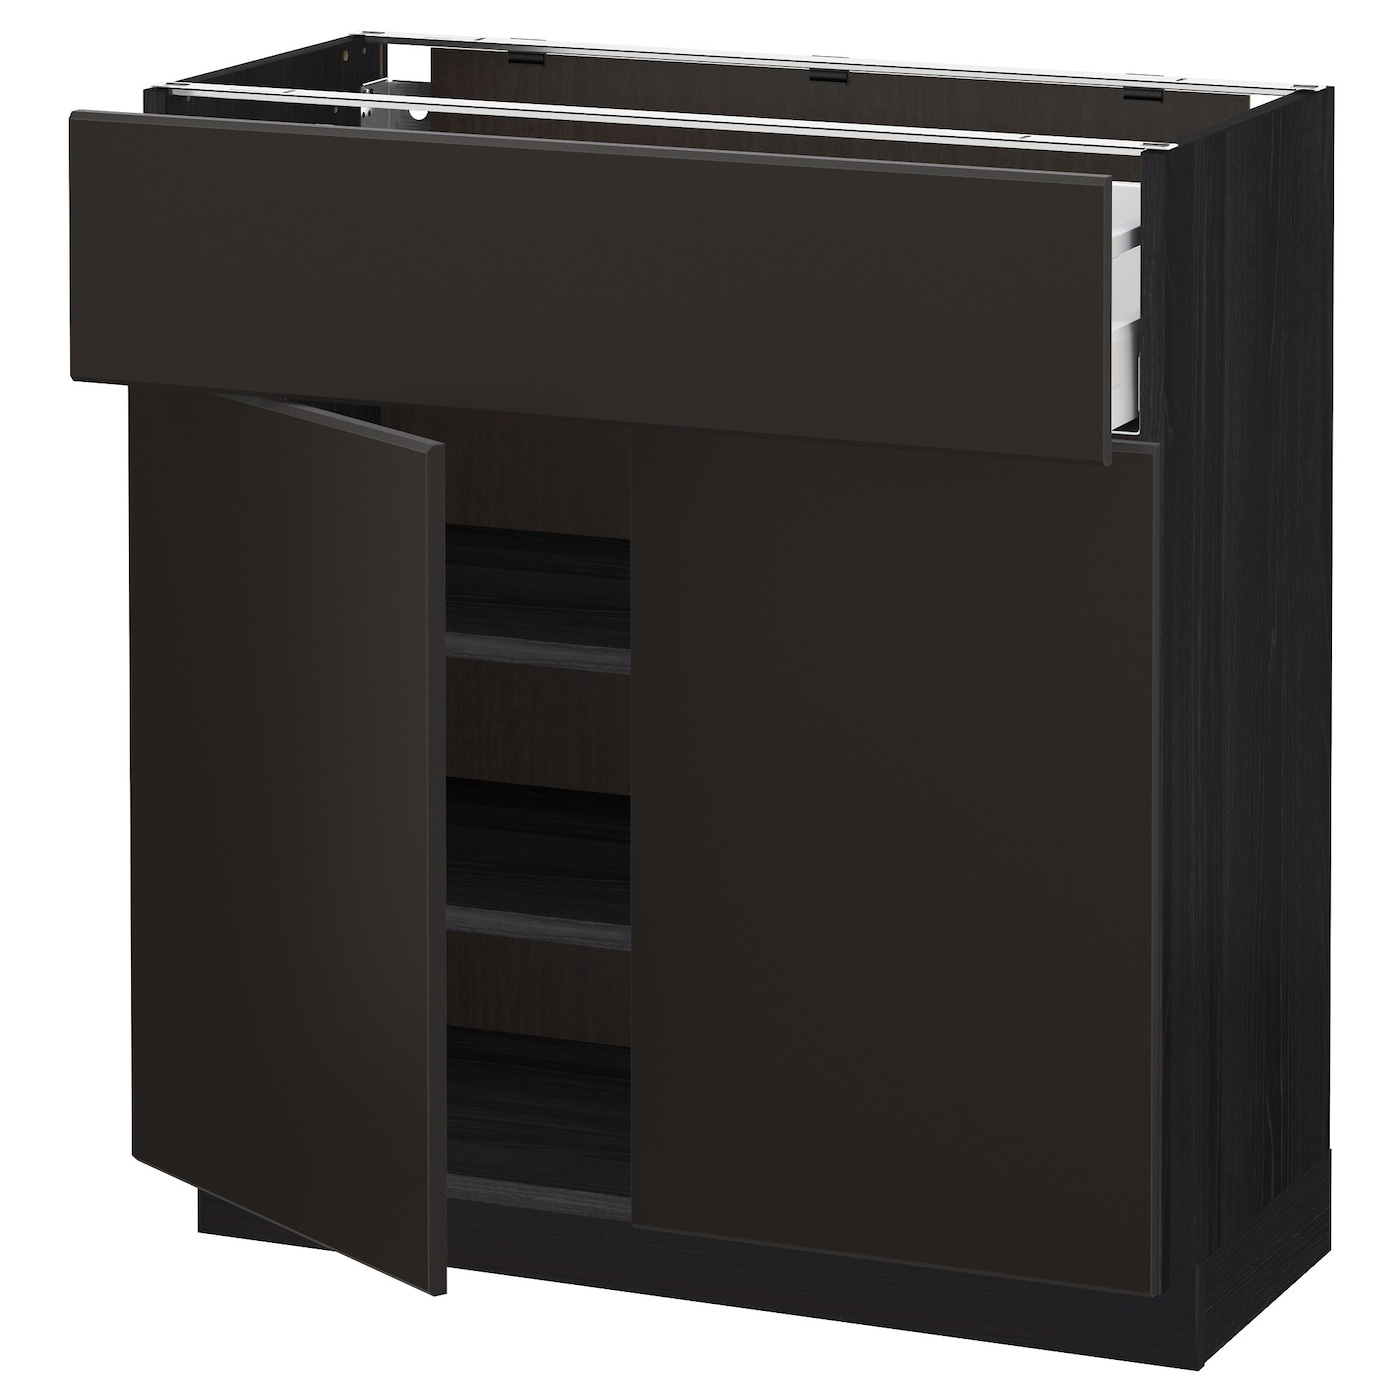 Black Kitchen Cabinet Doors: METOD/MAXIMERA Base Cabinet With Drawer/2 Doors Black